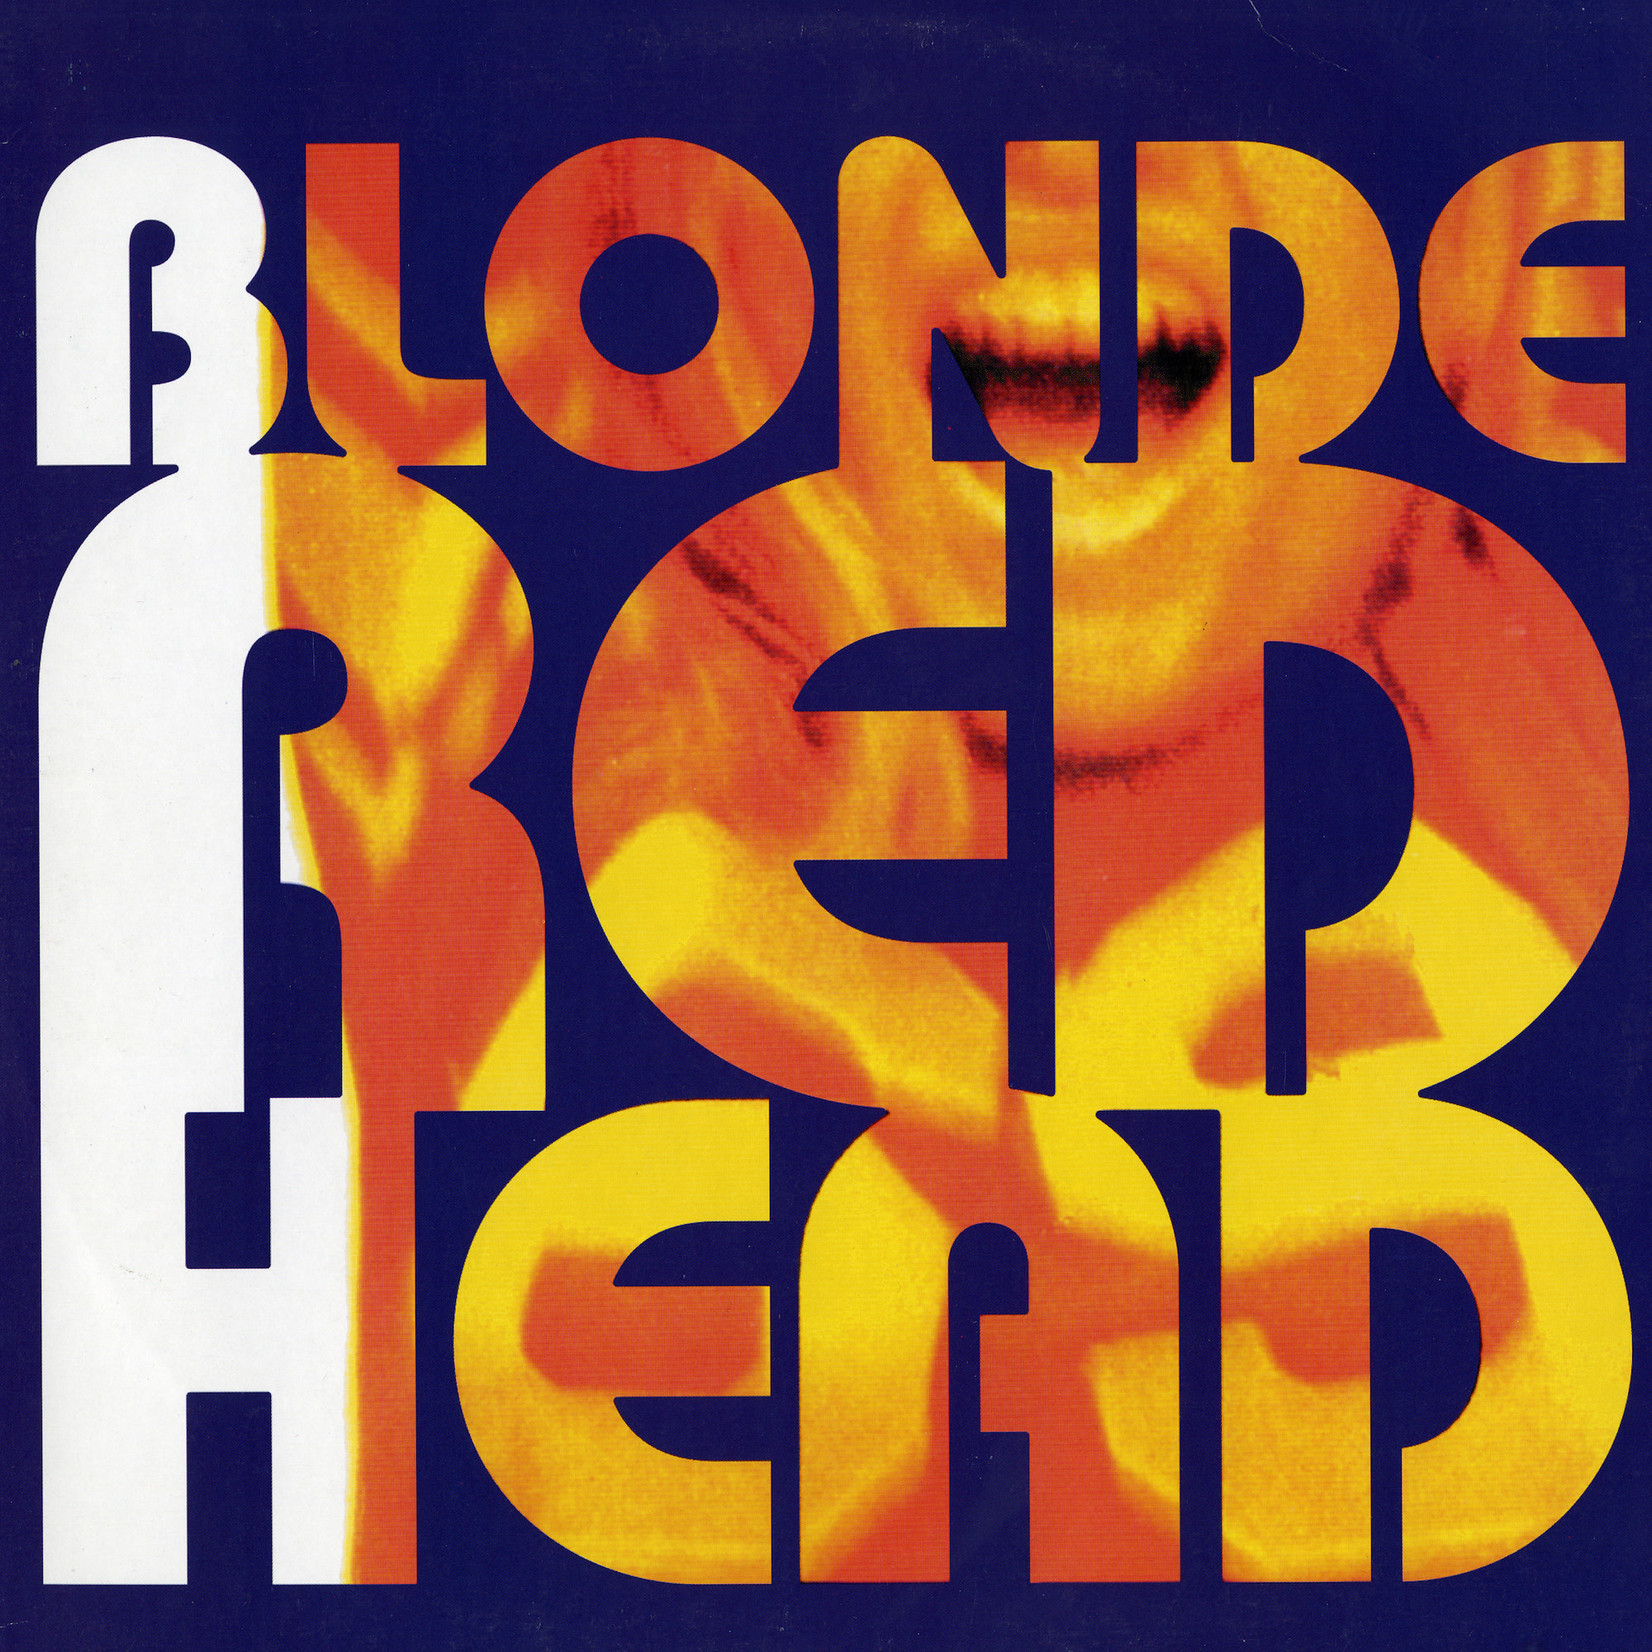 [New] Blonde Redhead: self-titled (black vinyl)